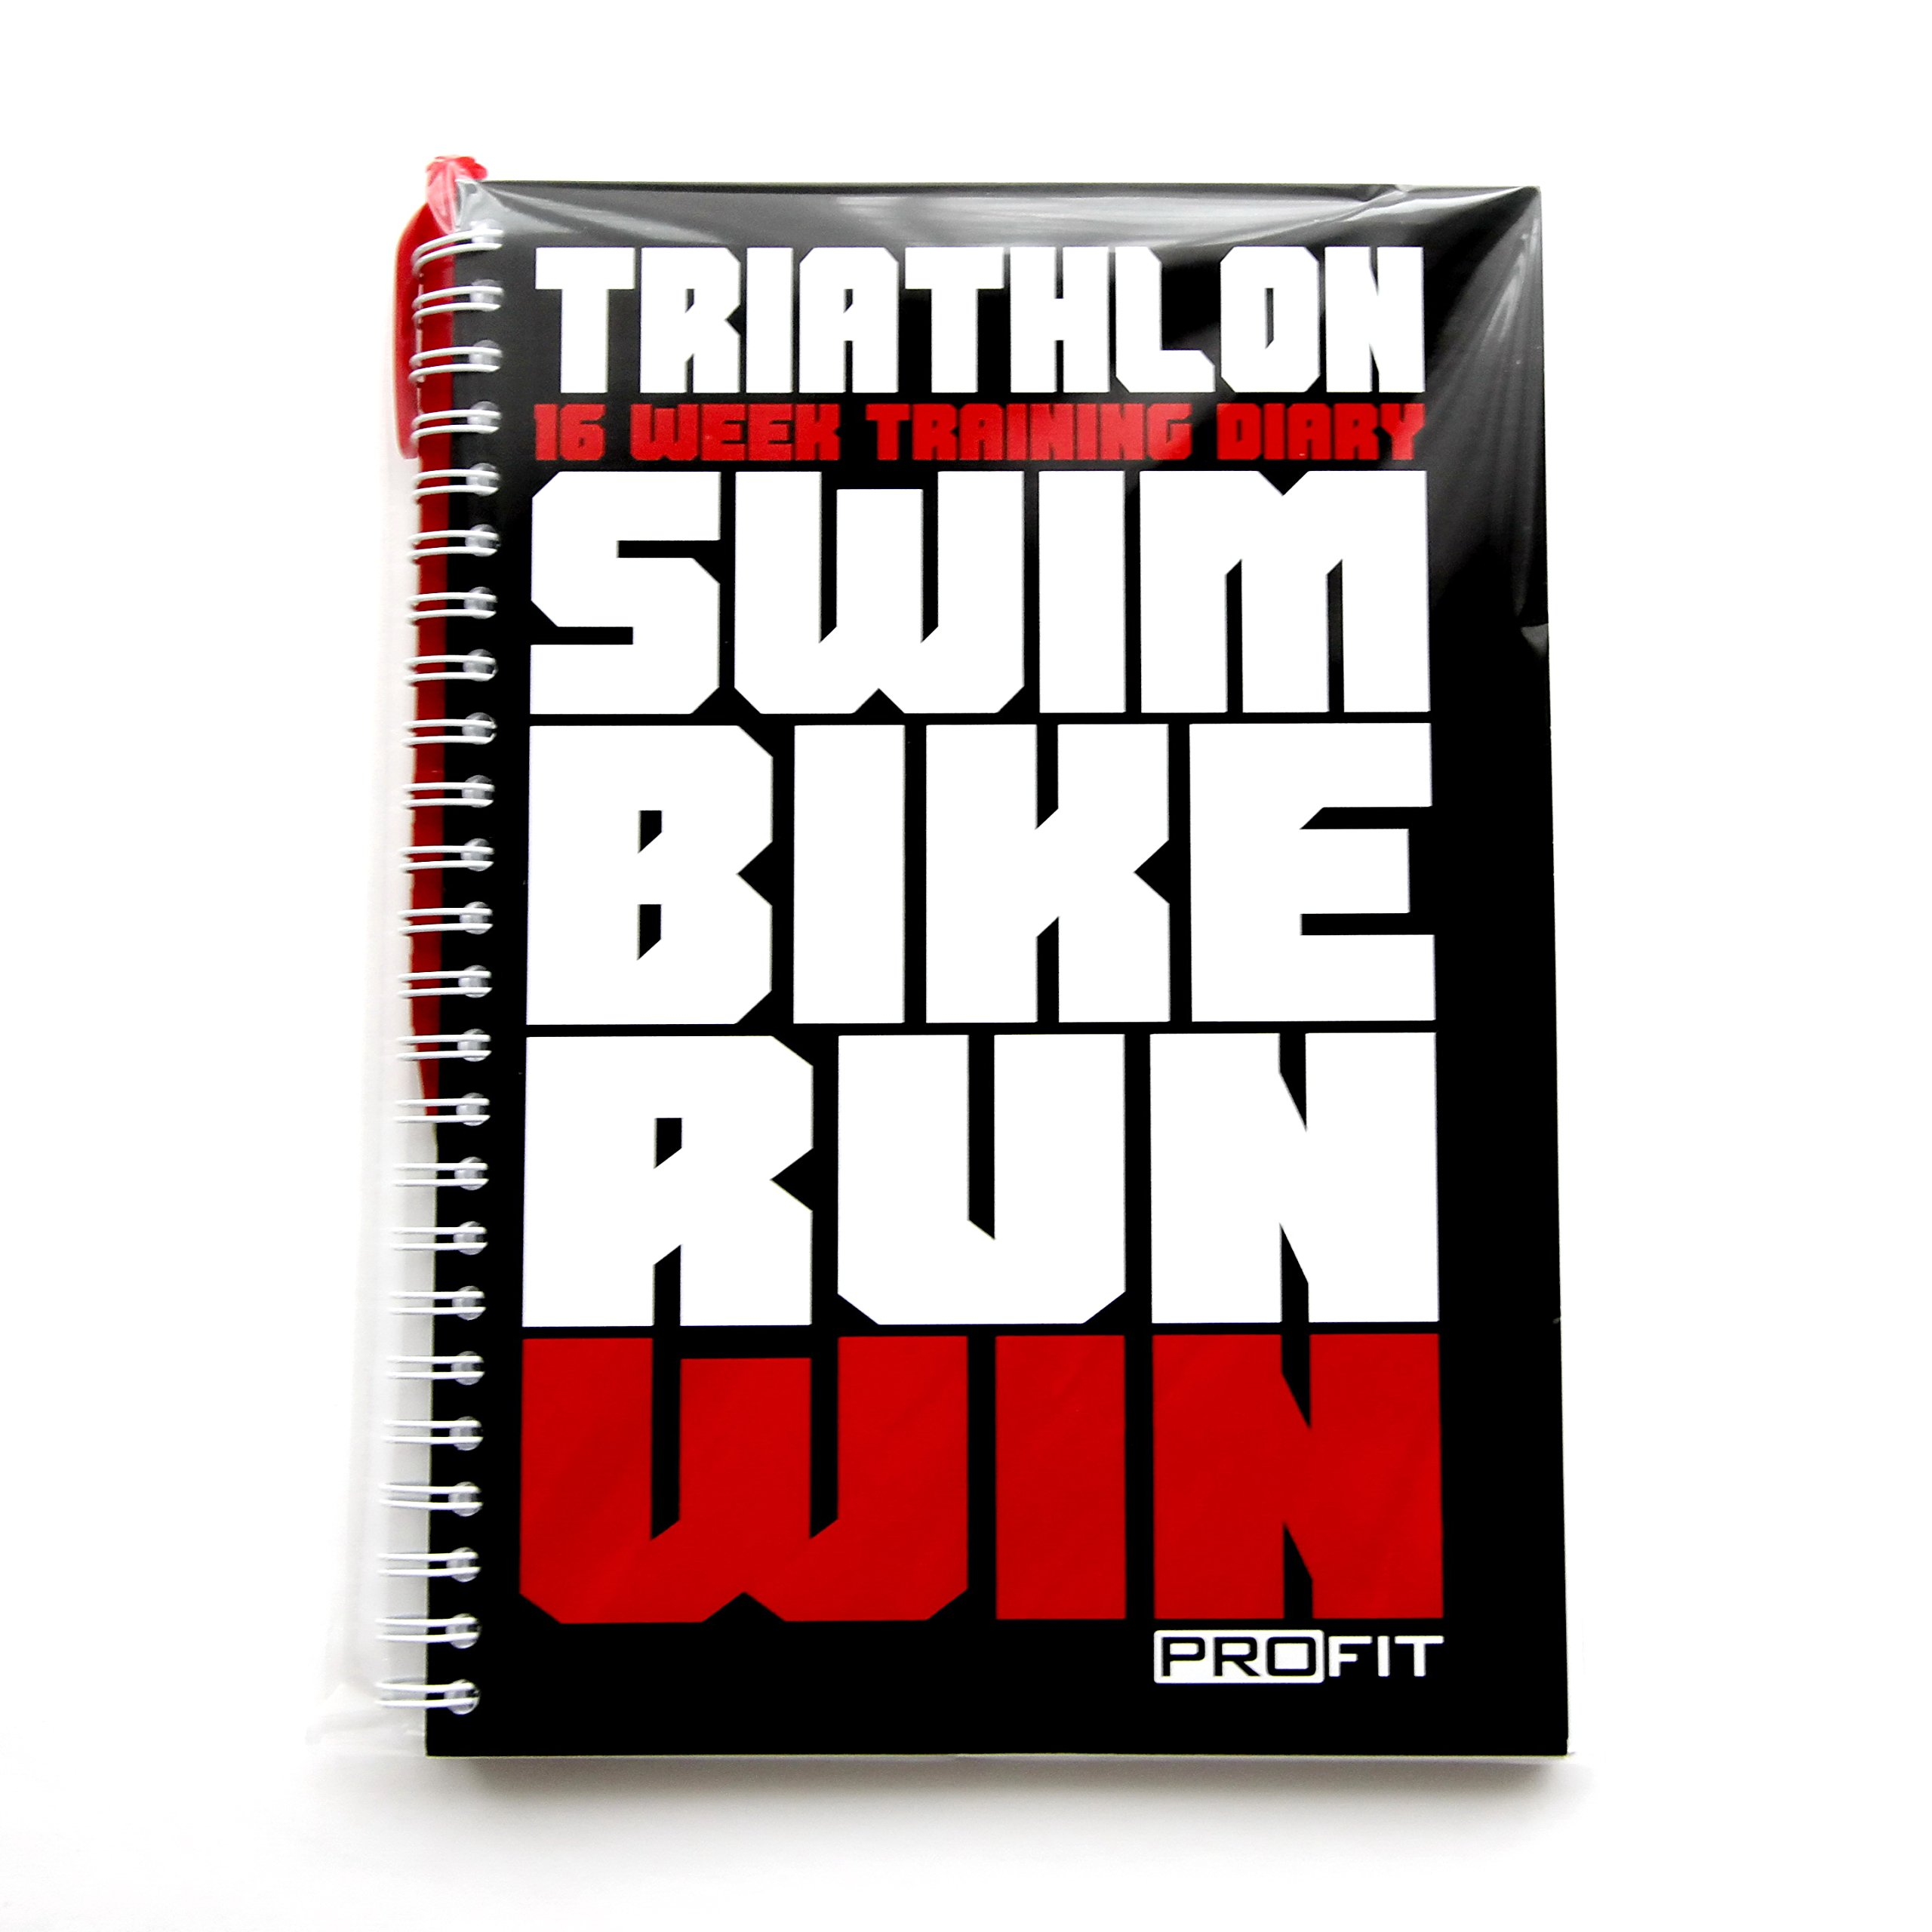 Triathlon & Running Training Diary Profit - Triathlete's Training Journal - 16-Week Triathlon Training Log - A5 Run Planner / 6x8 inches/Pen Included / 160 Pages/Undated / Wire-Bound